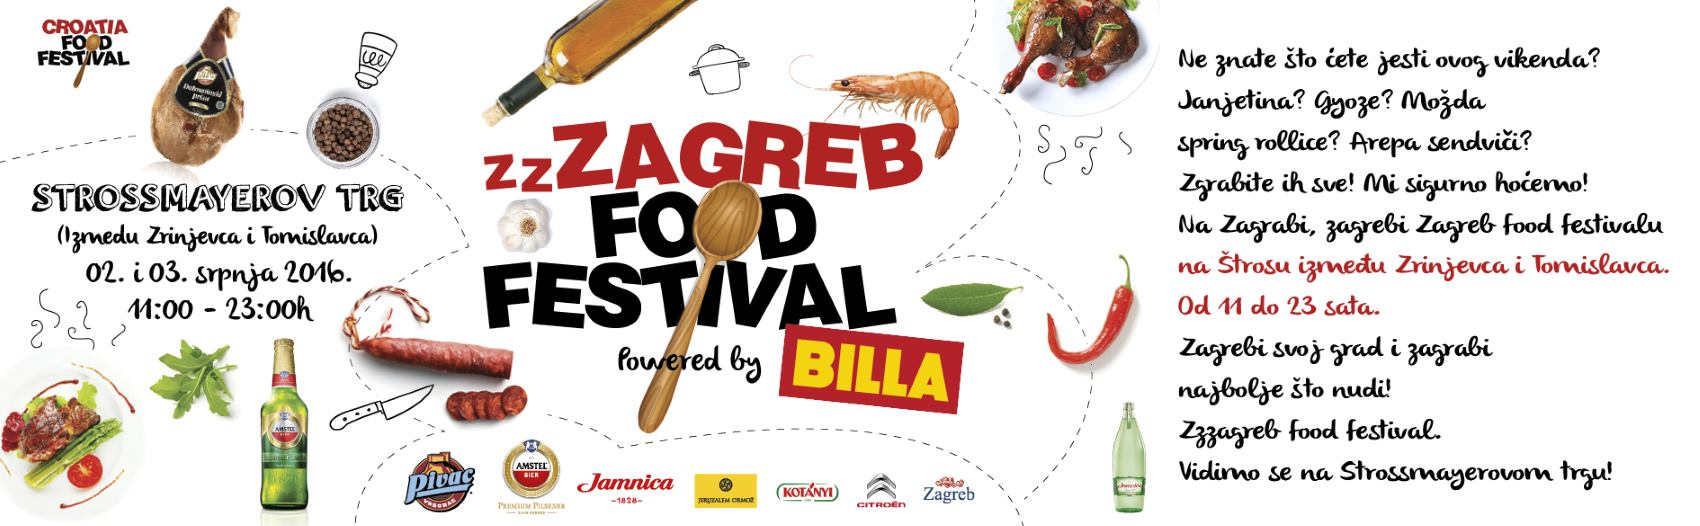 ZZZAGREB FOOD FESTIVAL Novo gastro iskustvo na Strossmayerovom trgu 2. i 3. srpnja